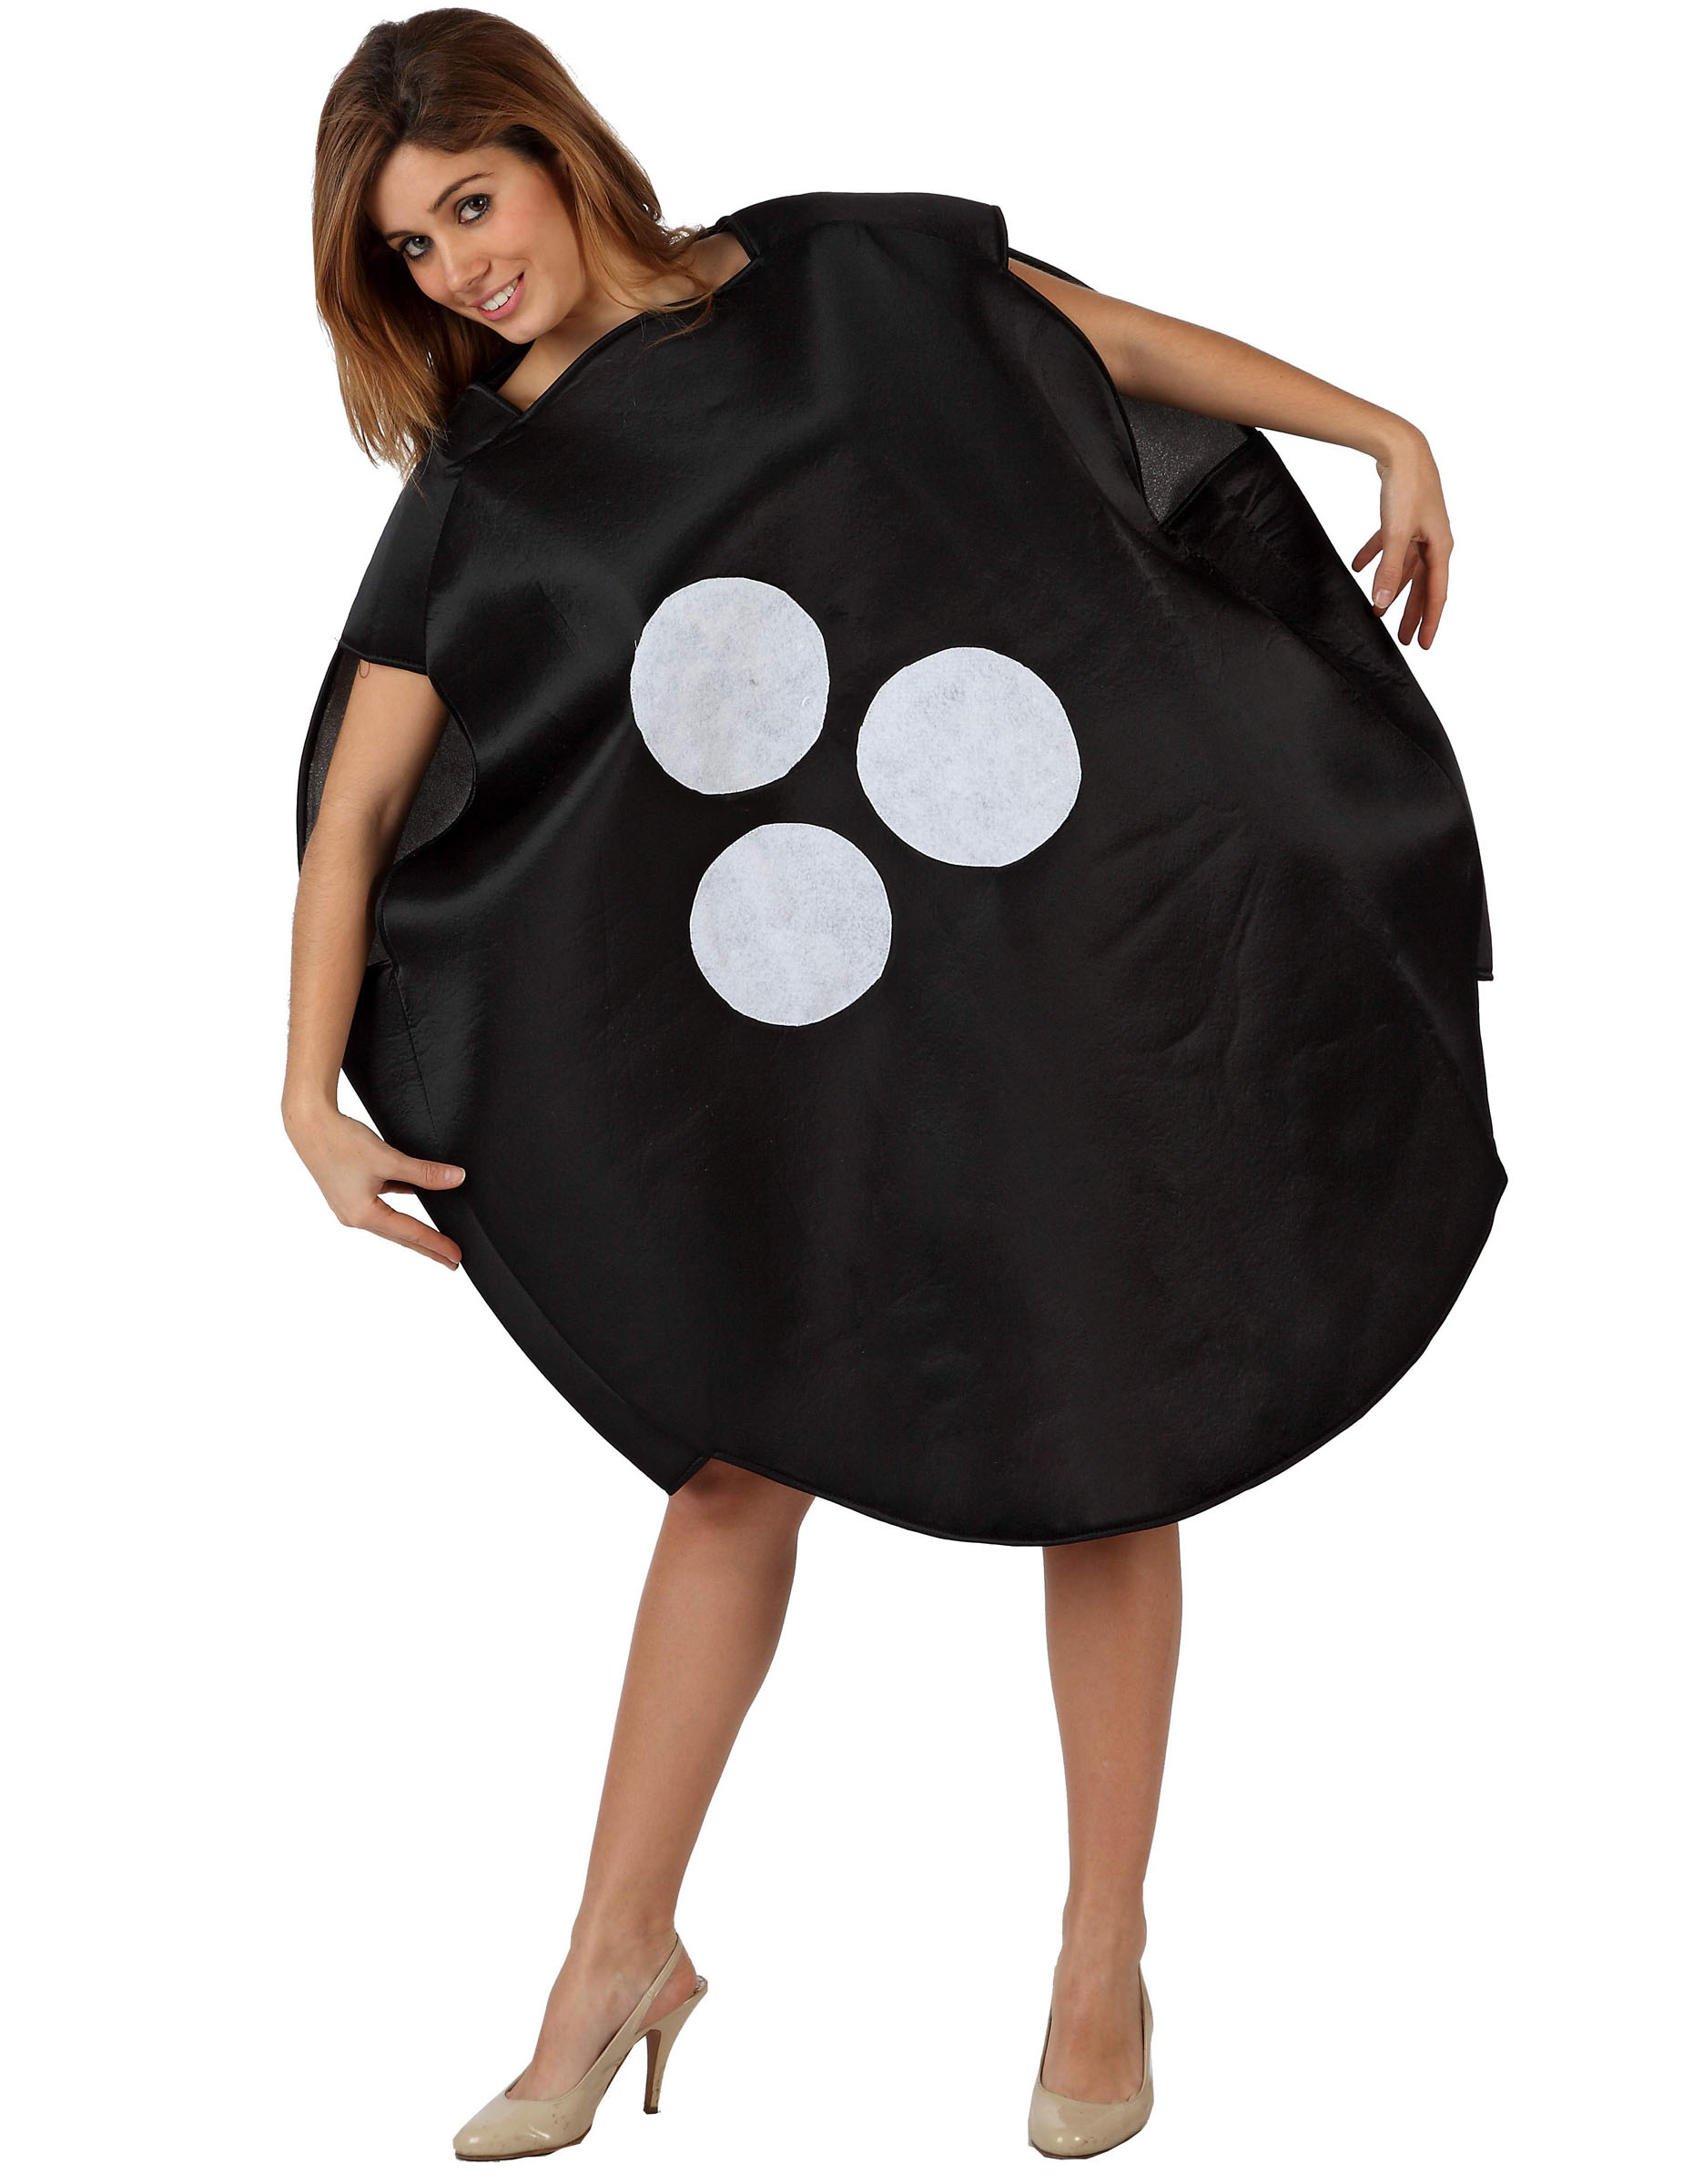 bowlingkugel damenkost m kost me f r erwachsene und. Black Bedroom Furniture Sets. Home Design Ideas